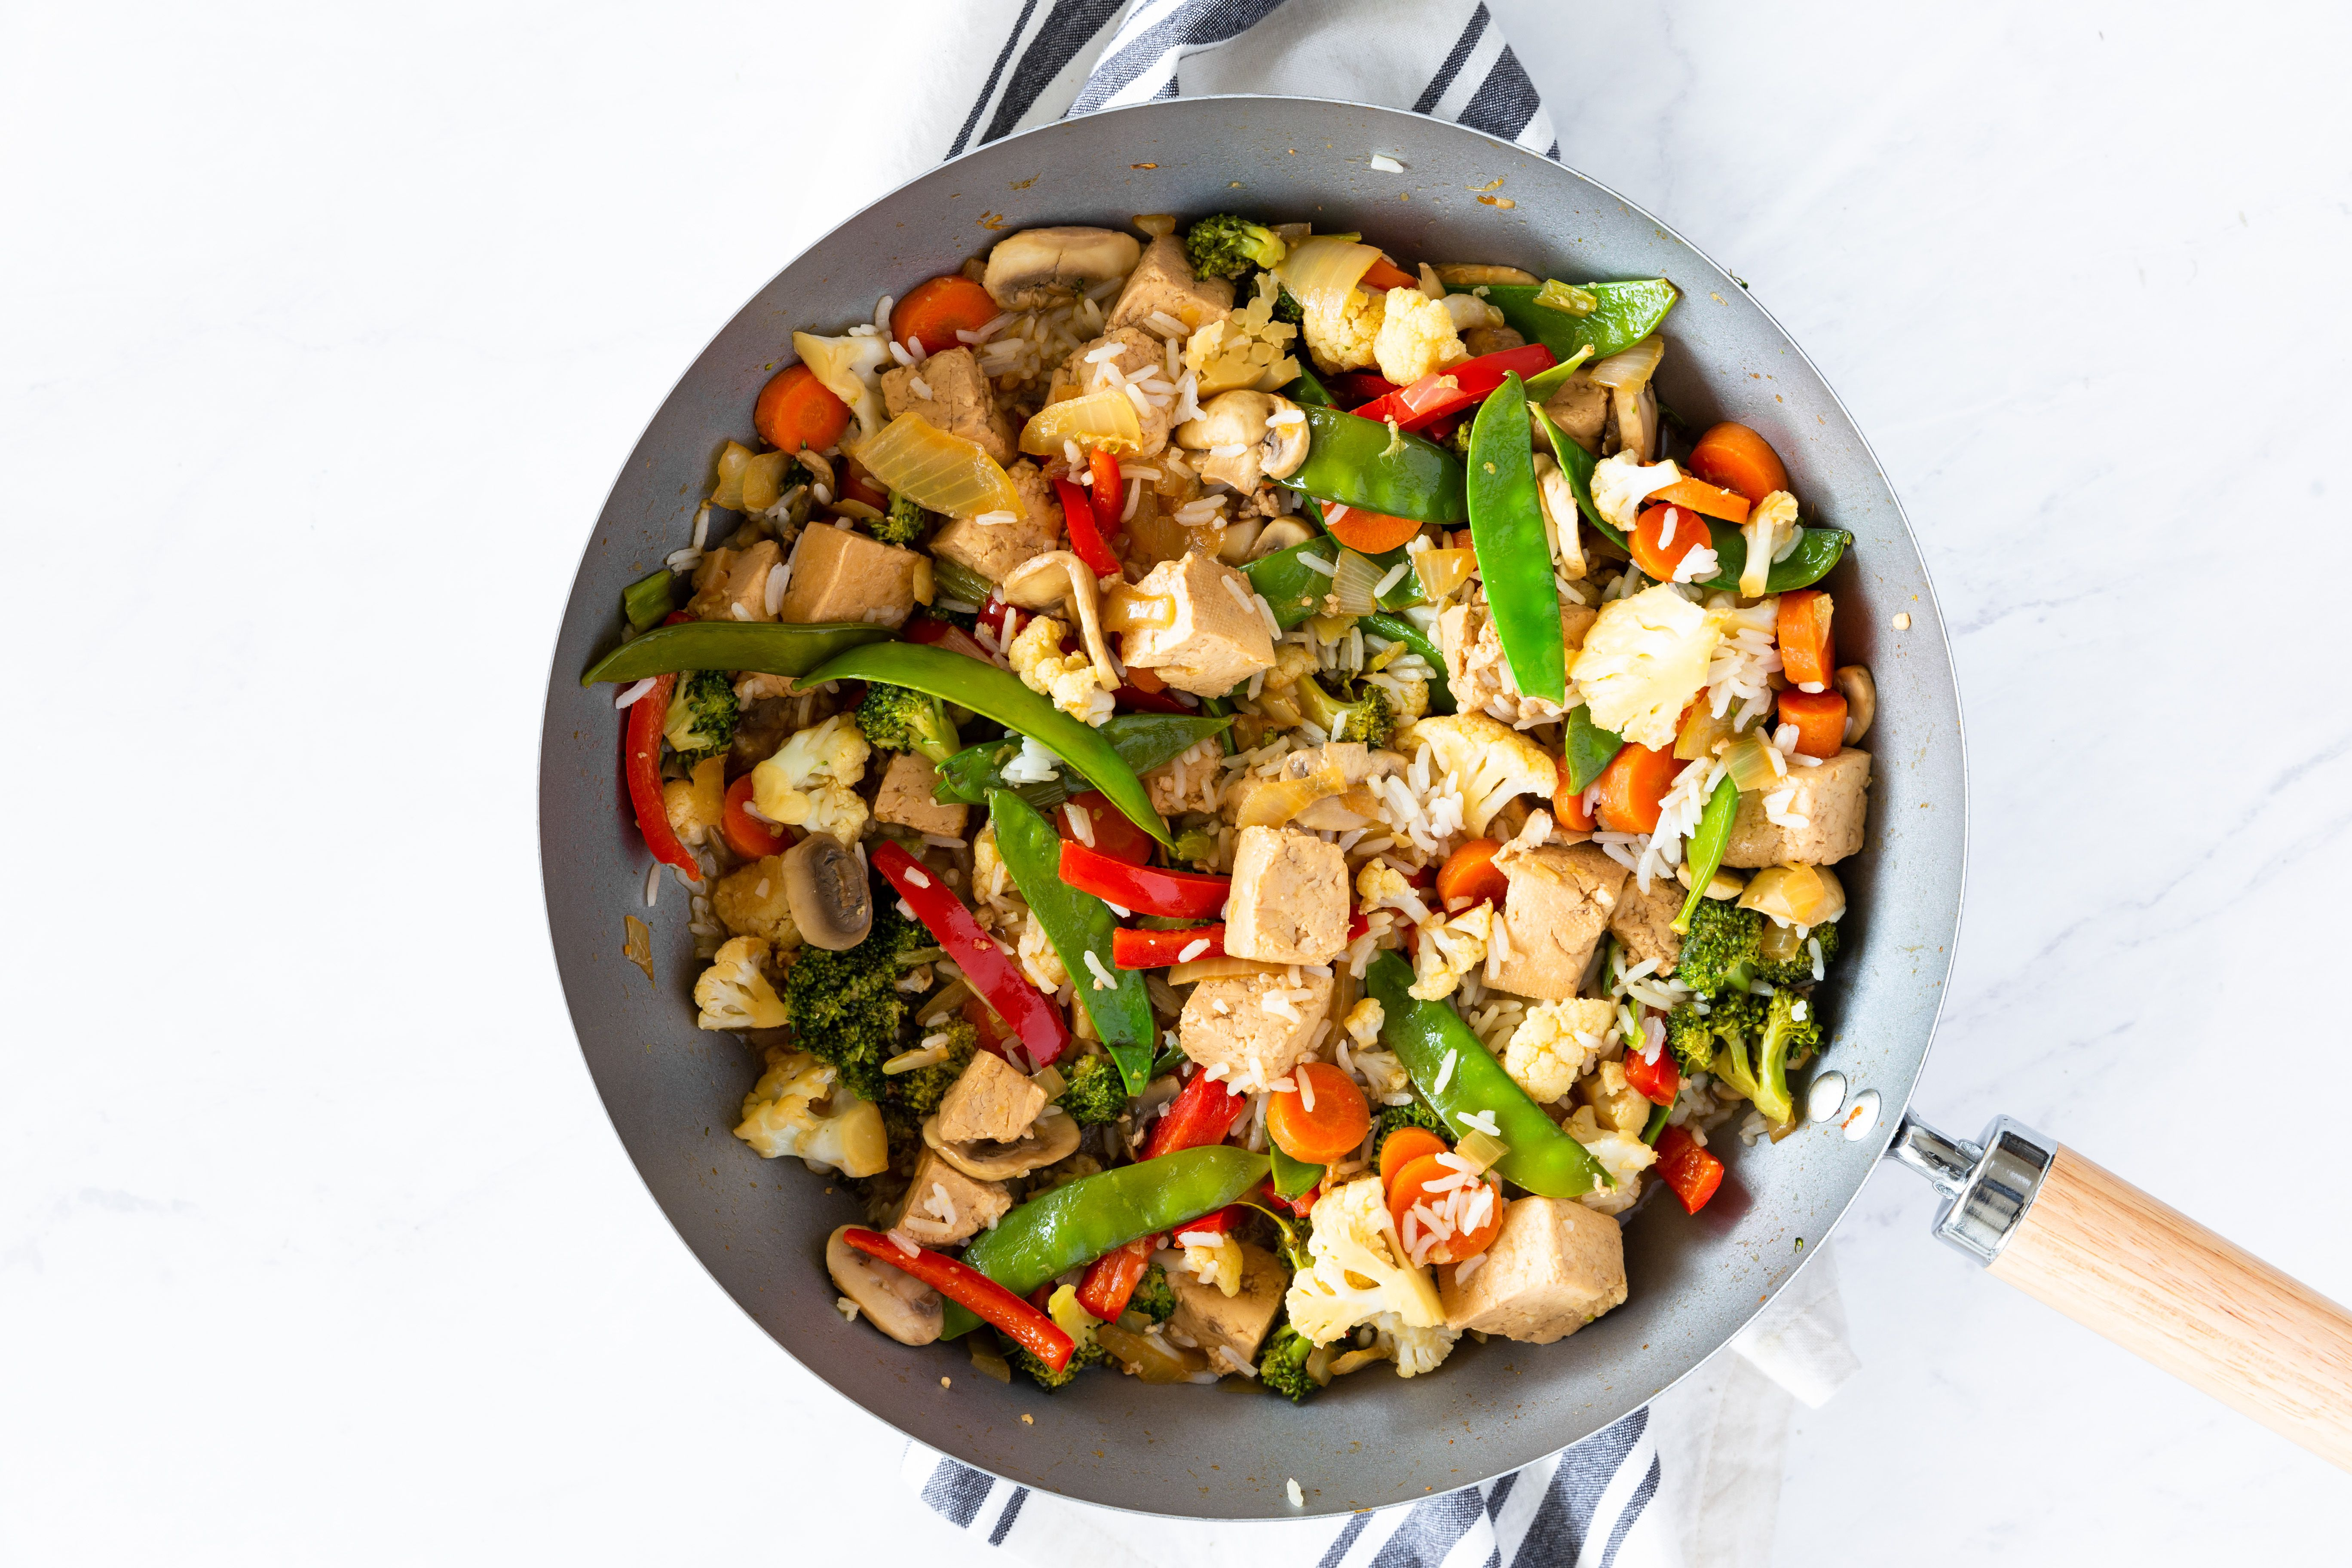 Rice and tofu-veggie stir fry in pan